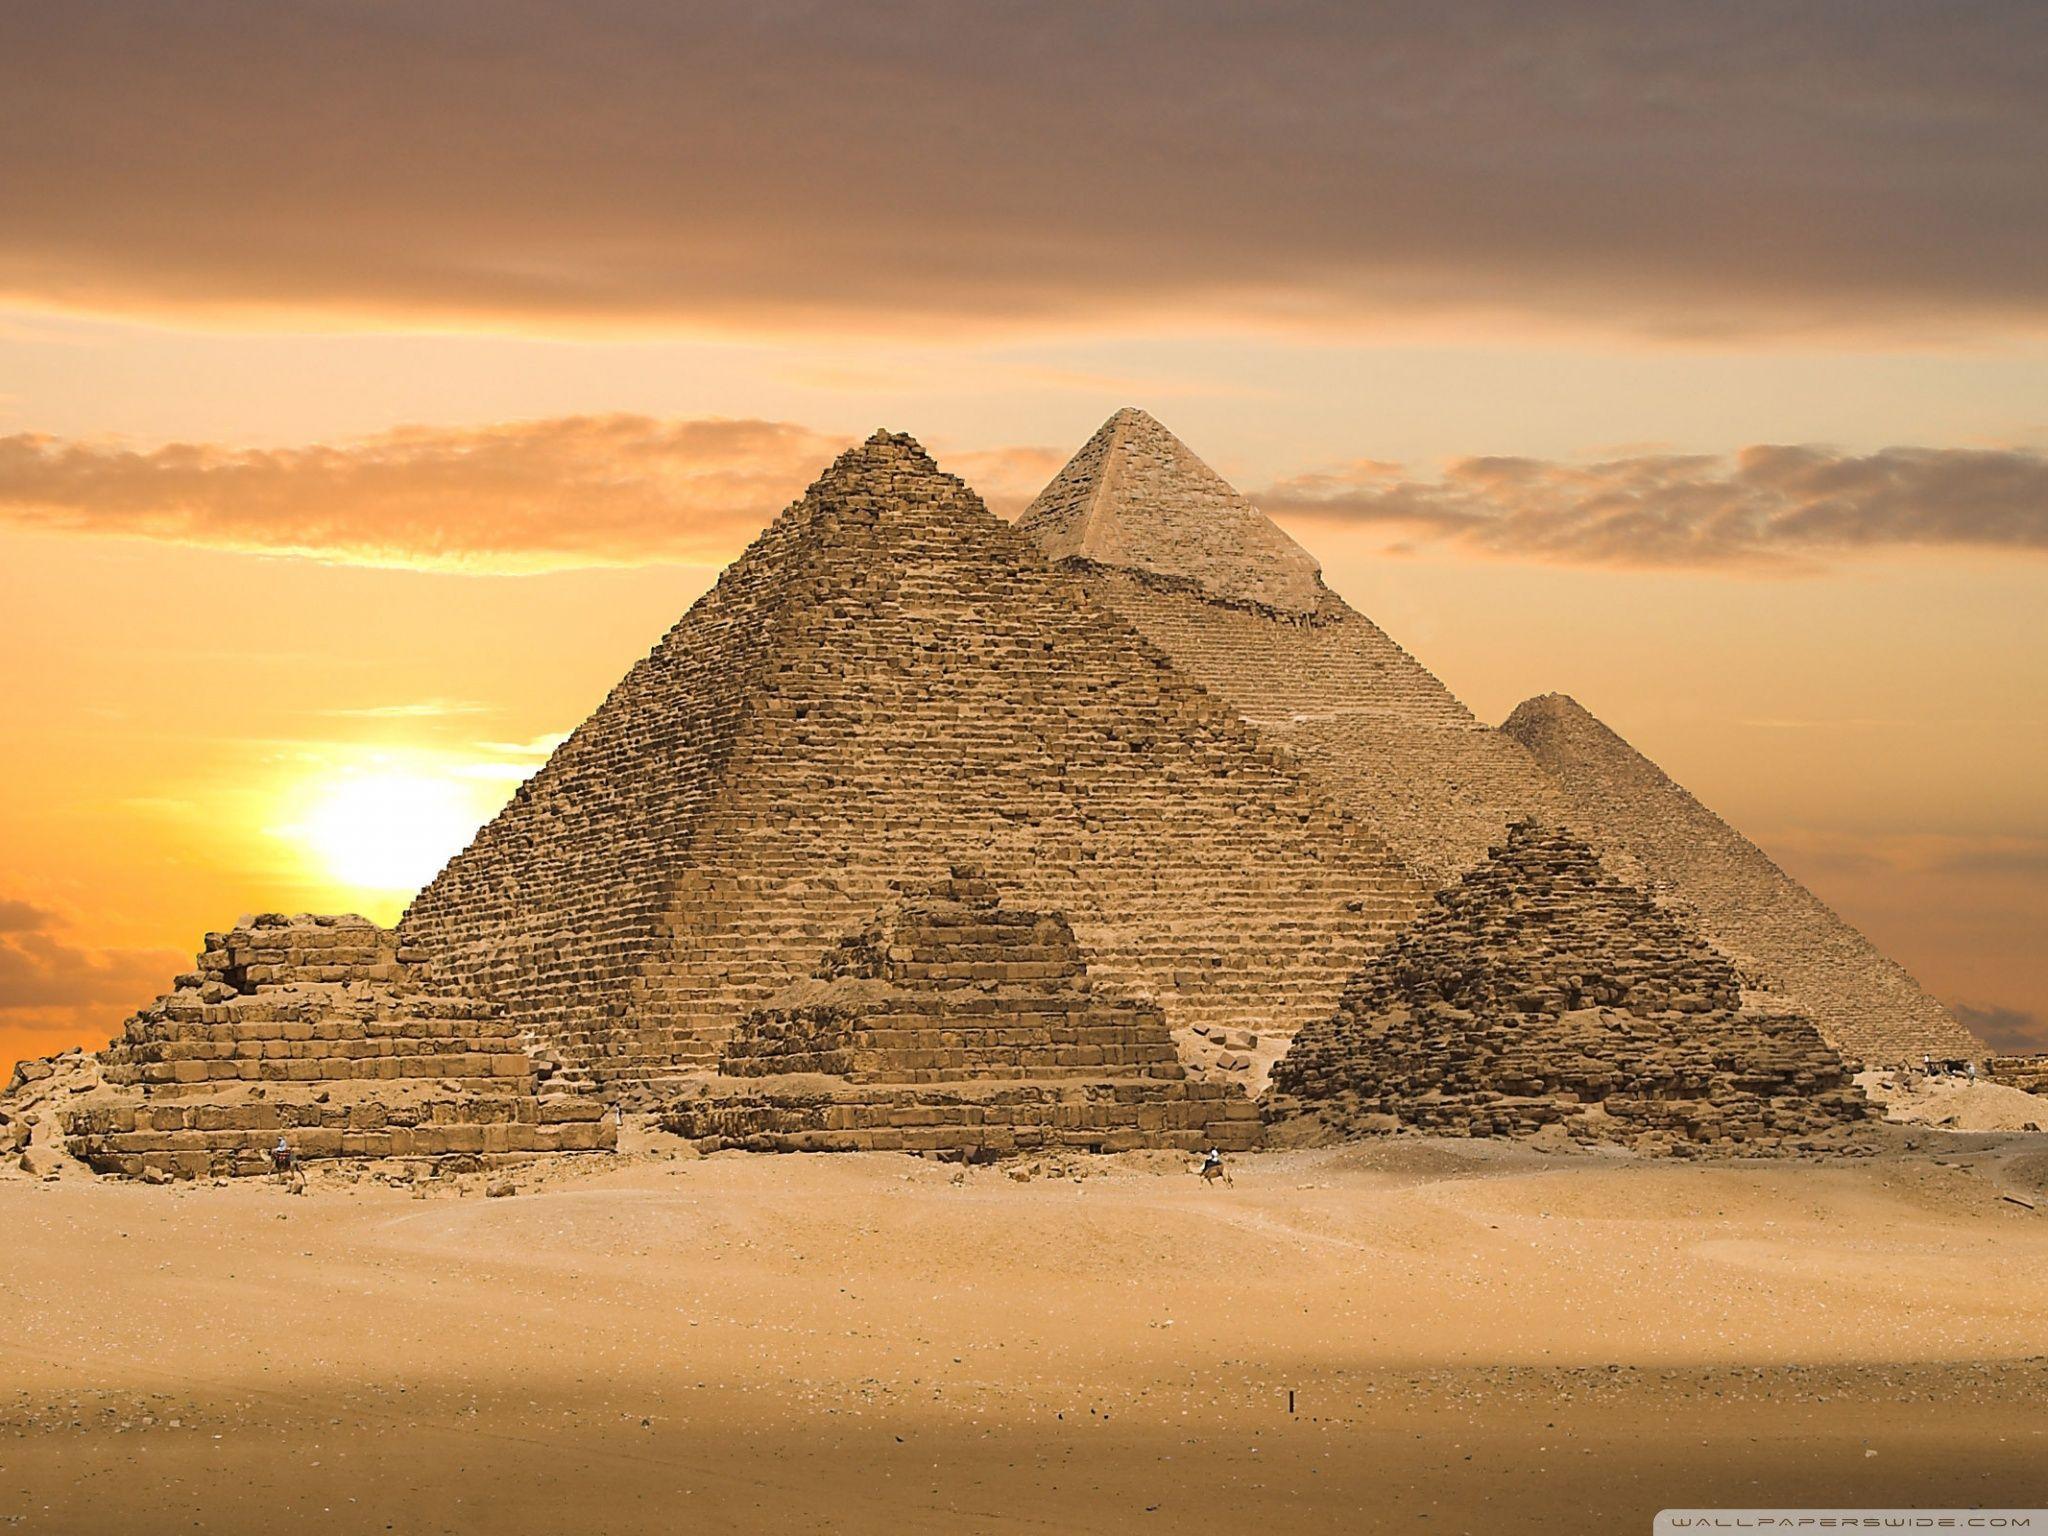 Egyptian Pyramids Wallpapers Top Free Egyptian Pyramids